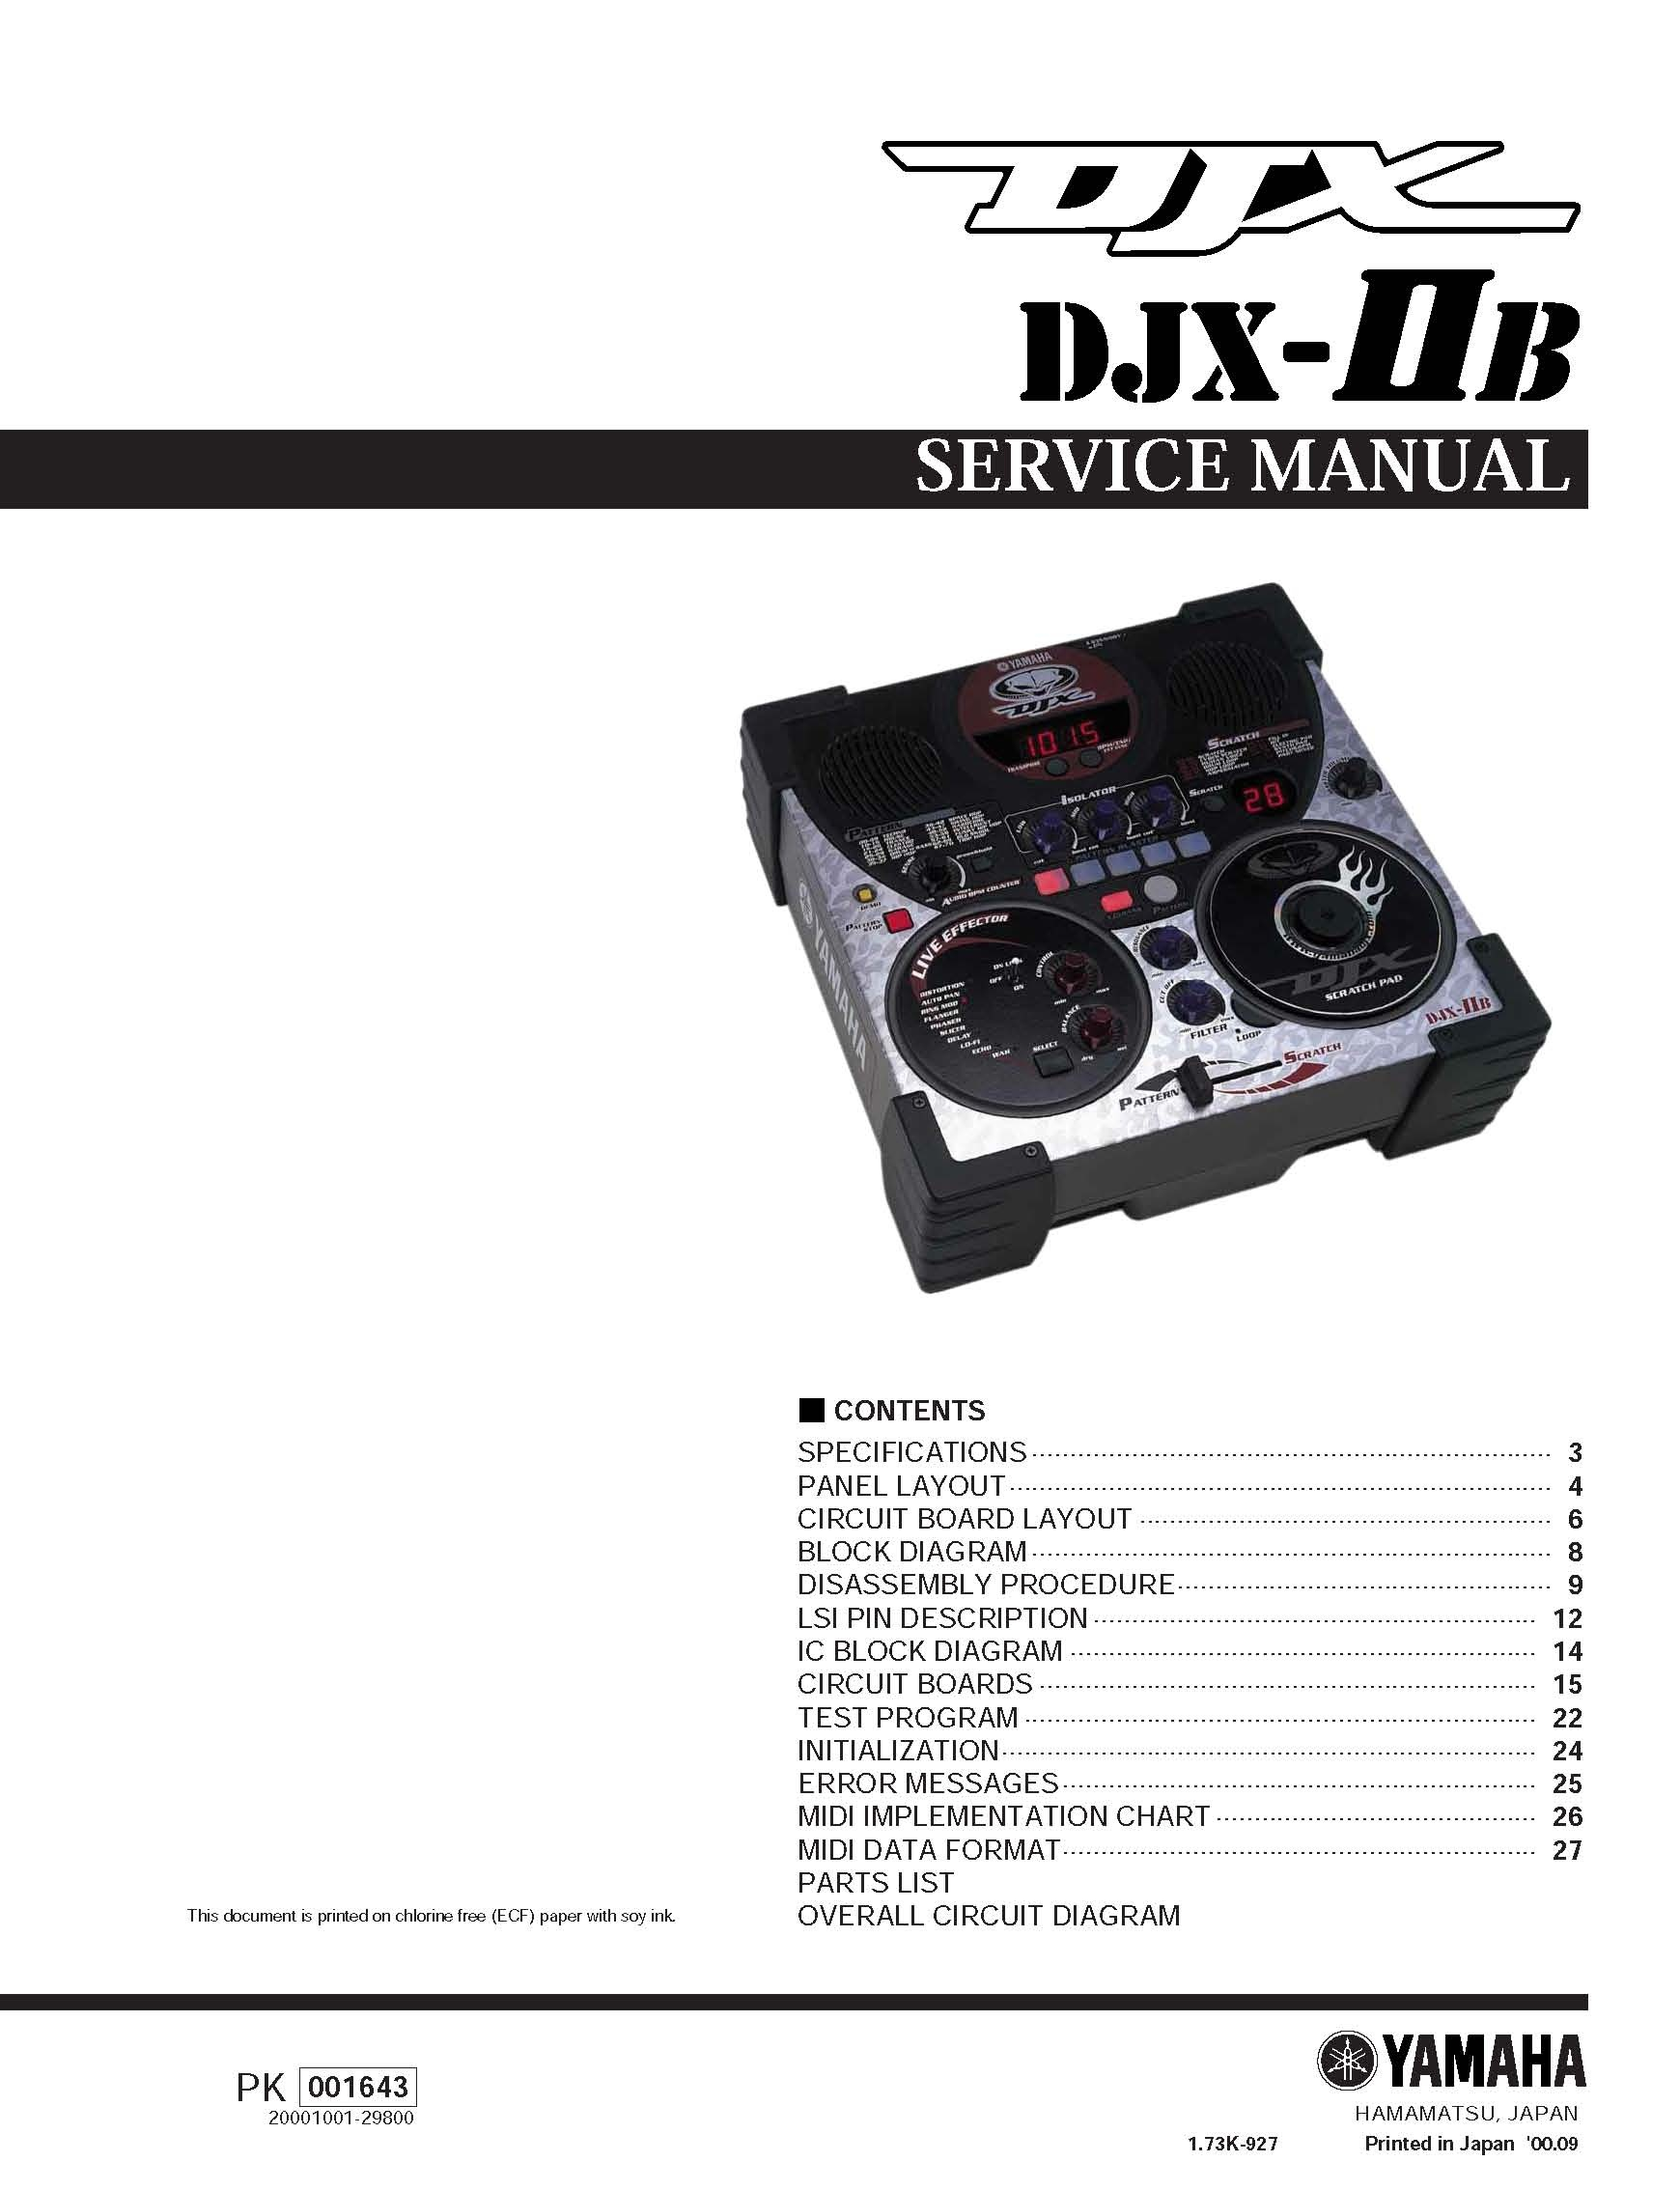 yamaha djx iib service manual music manuals rh sellfy com Yamaha DJX Minor Chords Yamaha DJX Keyboard